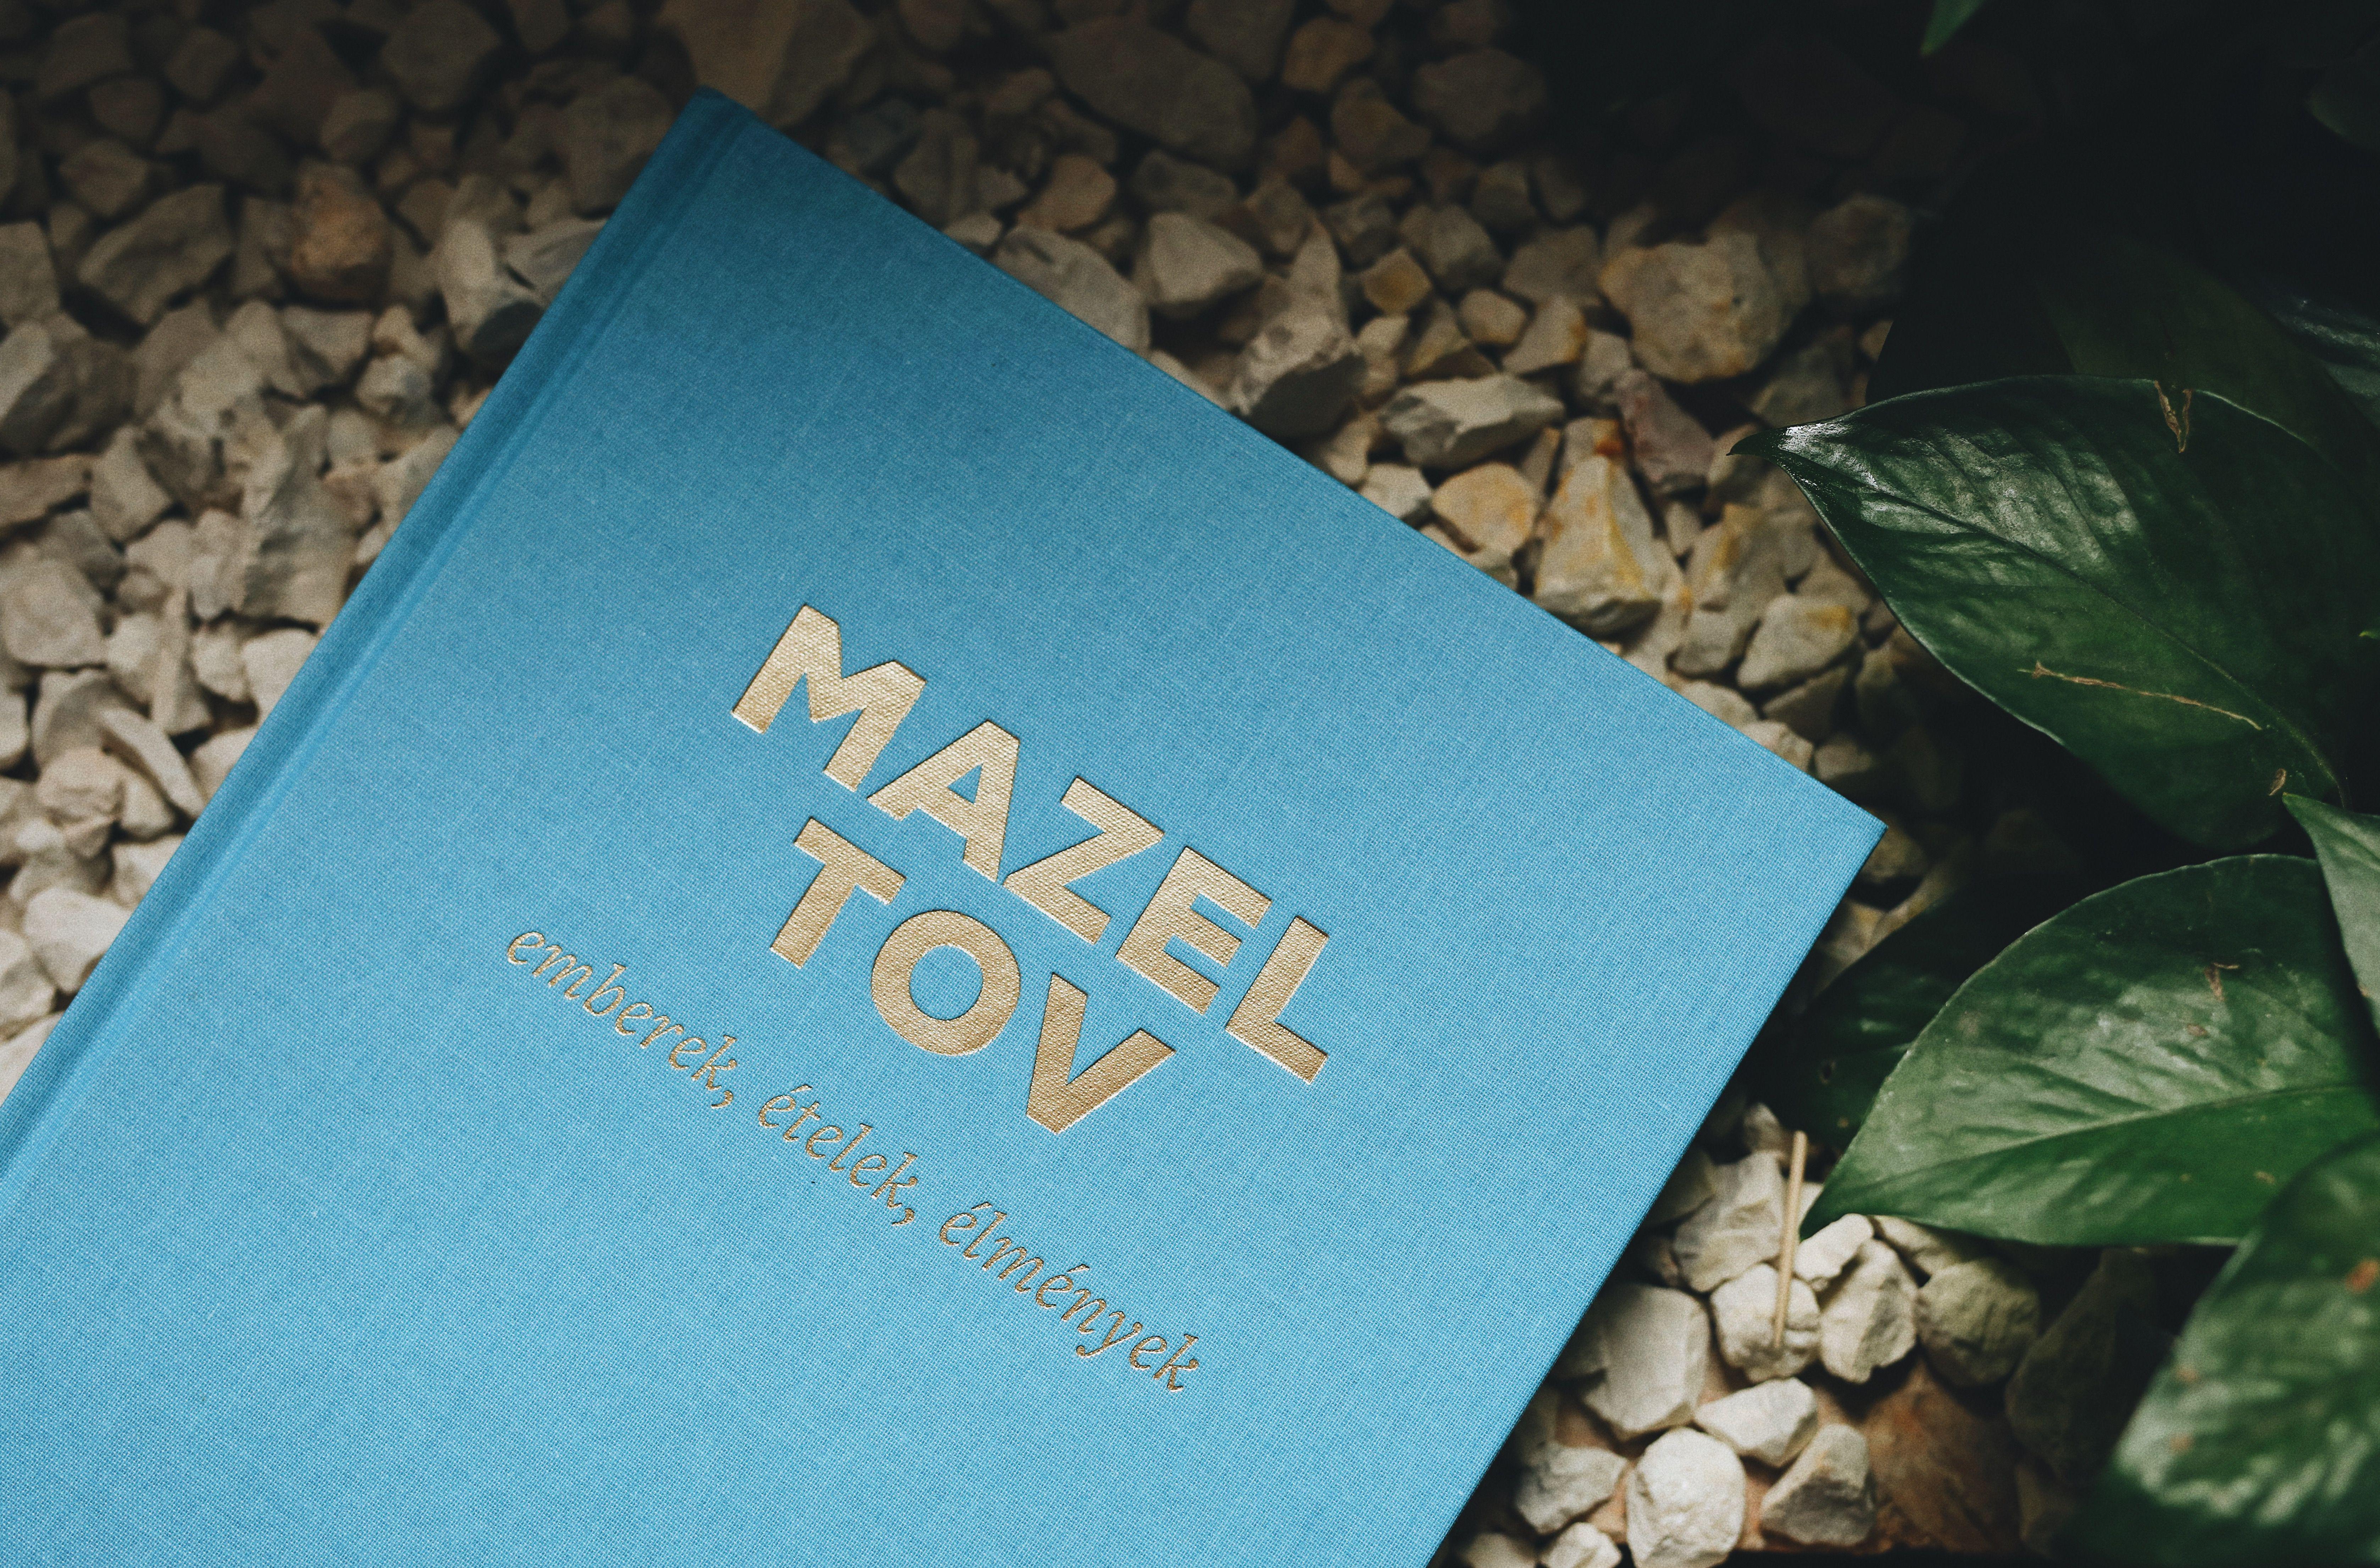 Mazel Tov Cookbook Mazel Tov Cookbook Book Cover